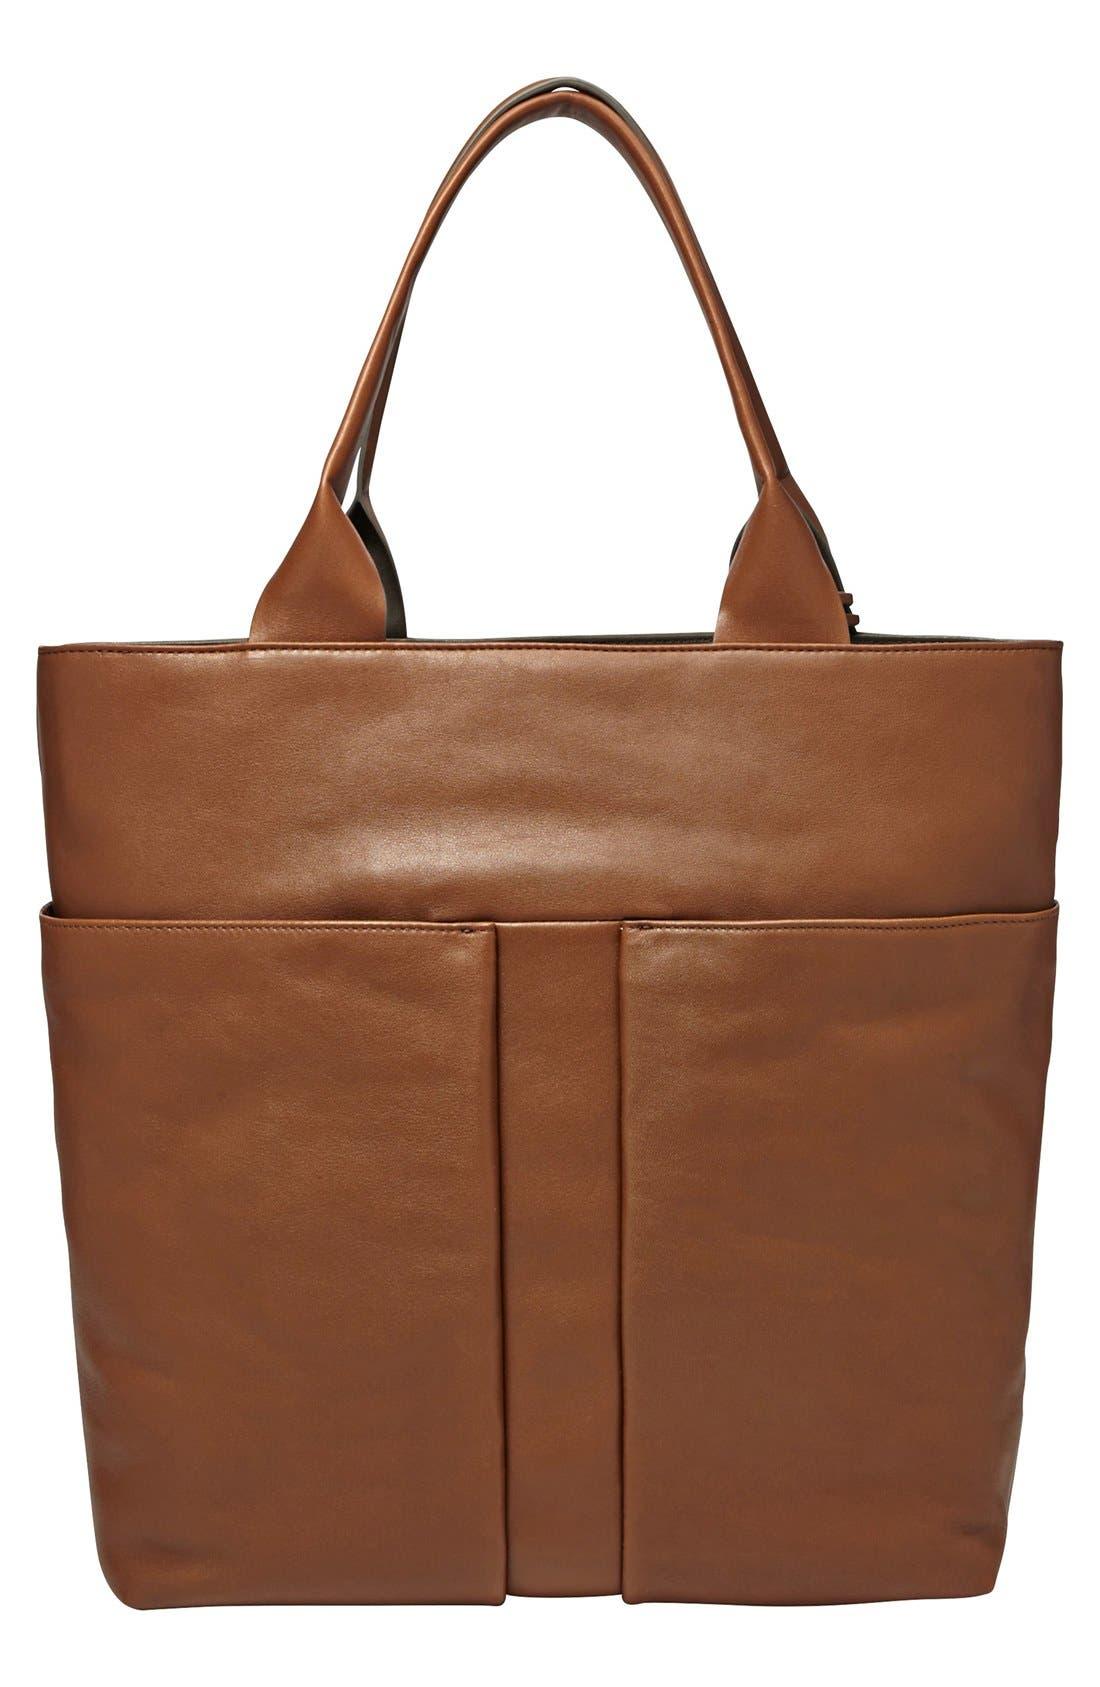 Main Image - Skagen 'Mathilde' Leather Tote